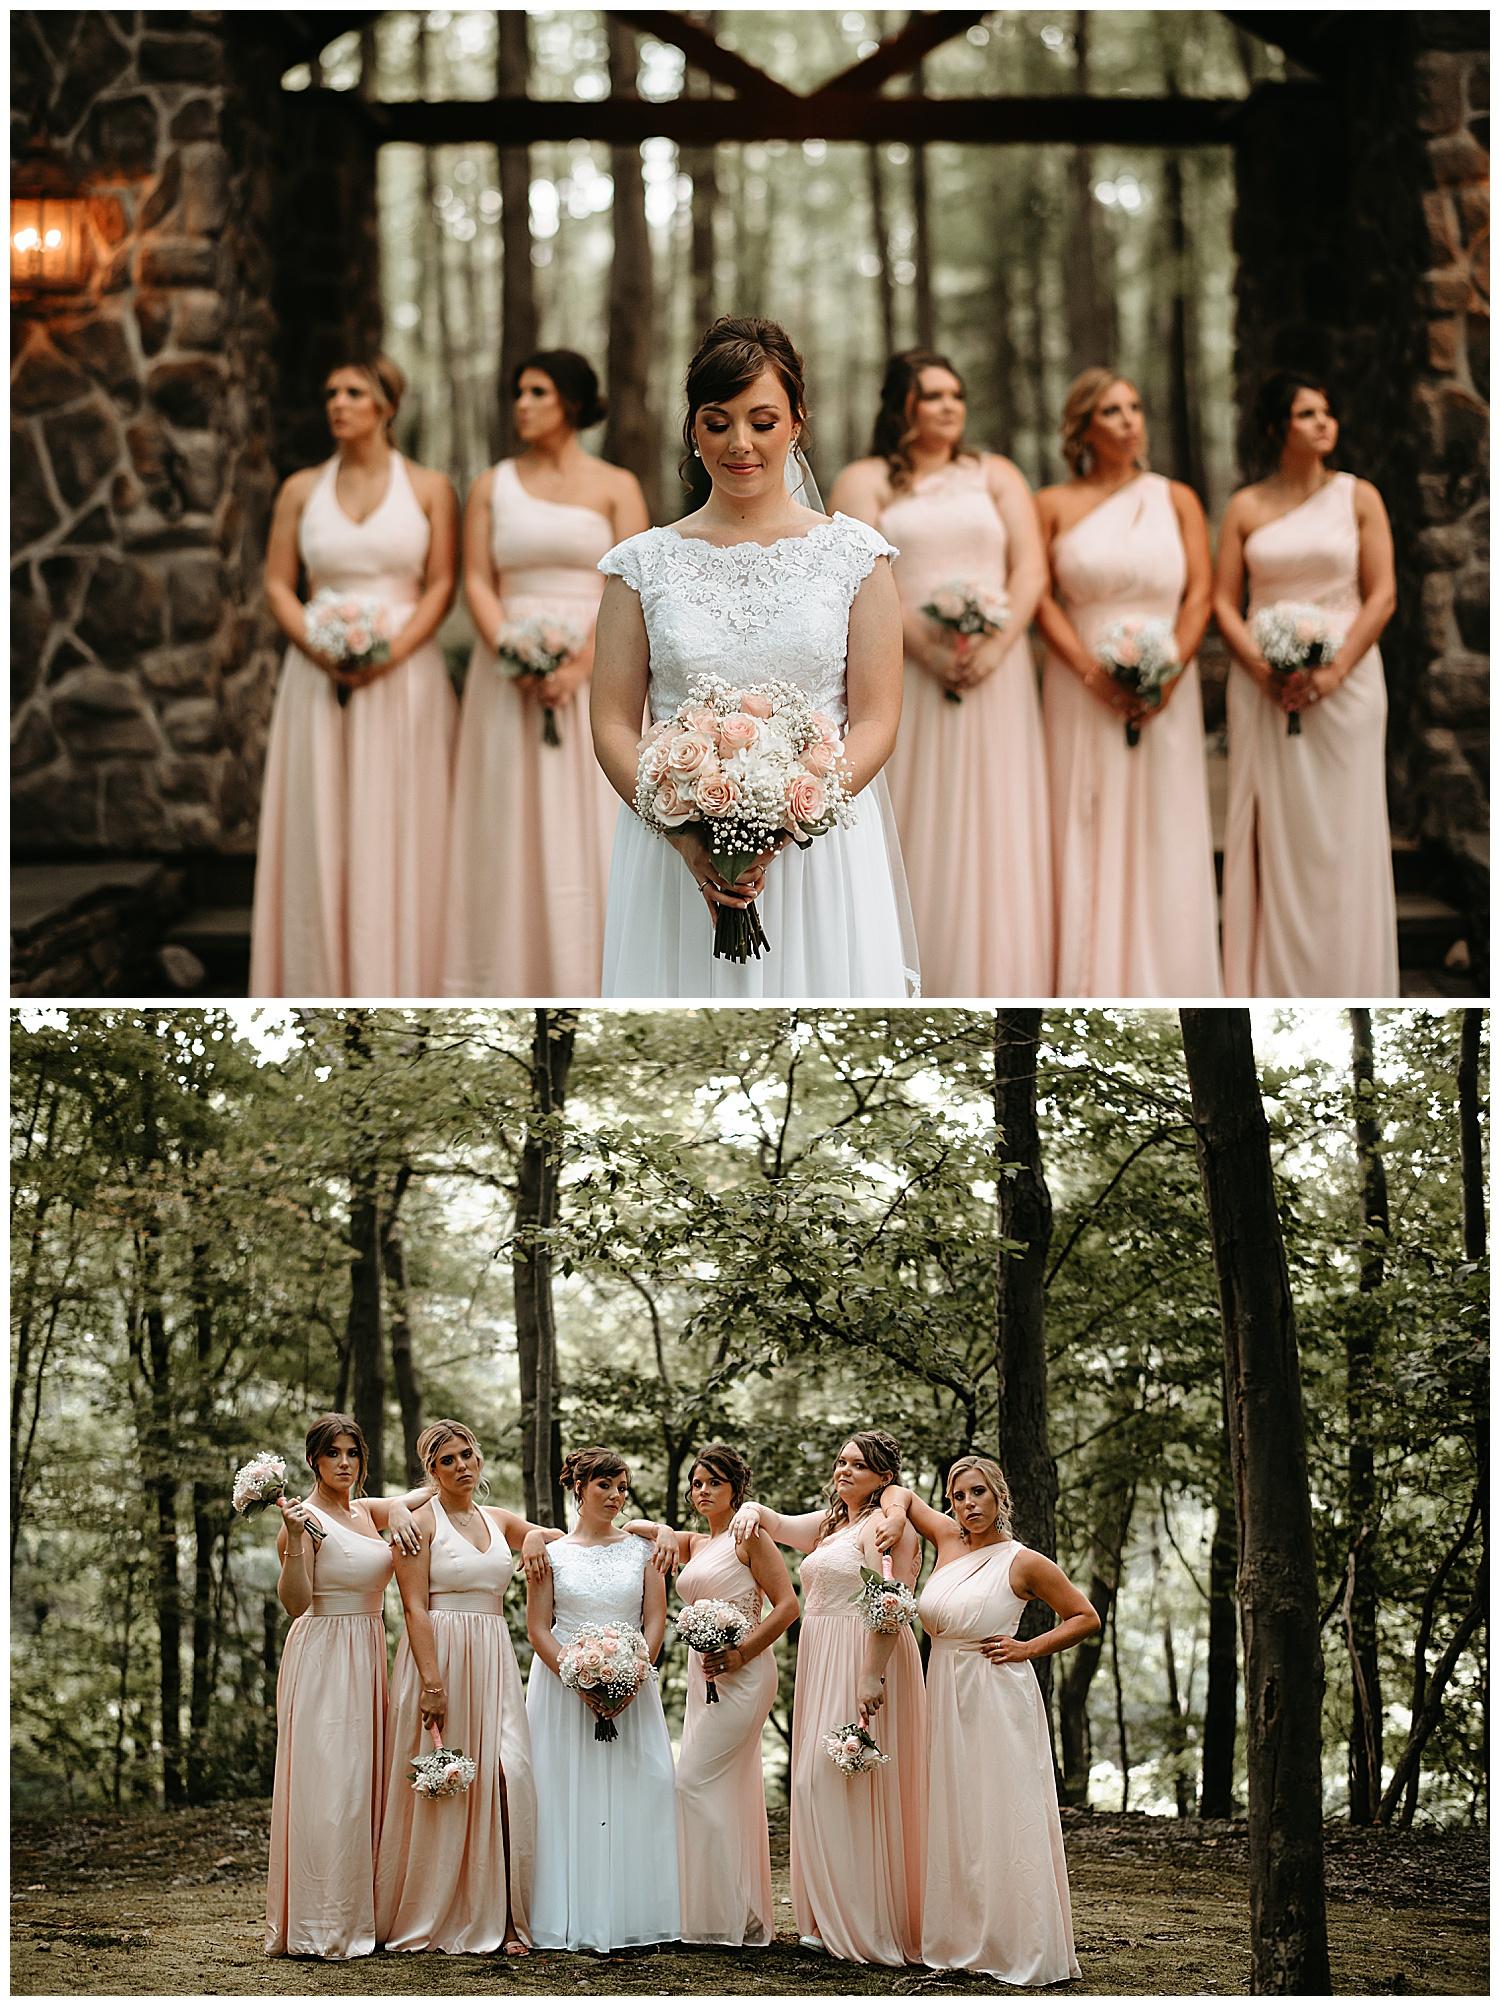 NEPA-Mount-Pocono-Wedding-Photographer-at-the-Stroudsmoor-Country-Inn-Stroudsburg-PA_0037.jpg